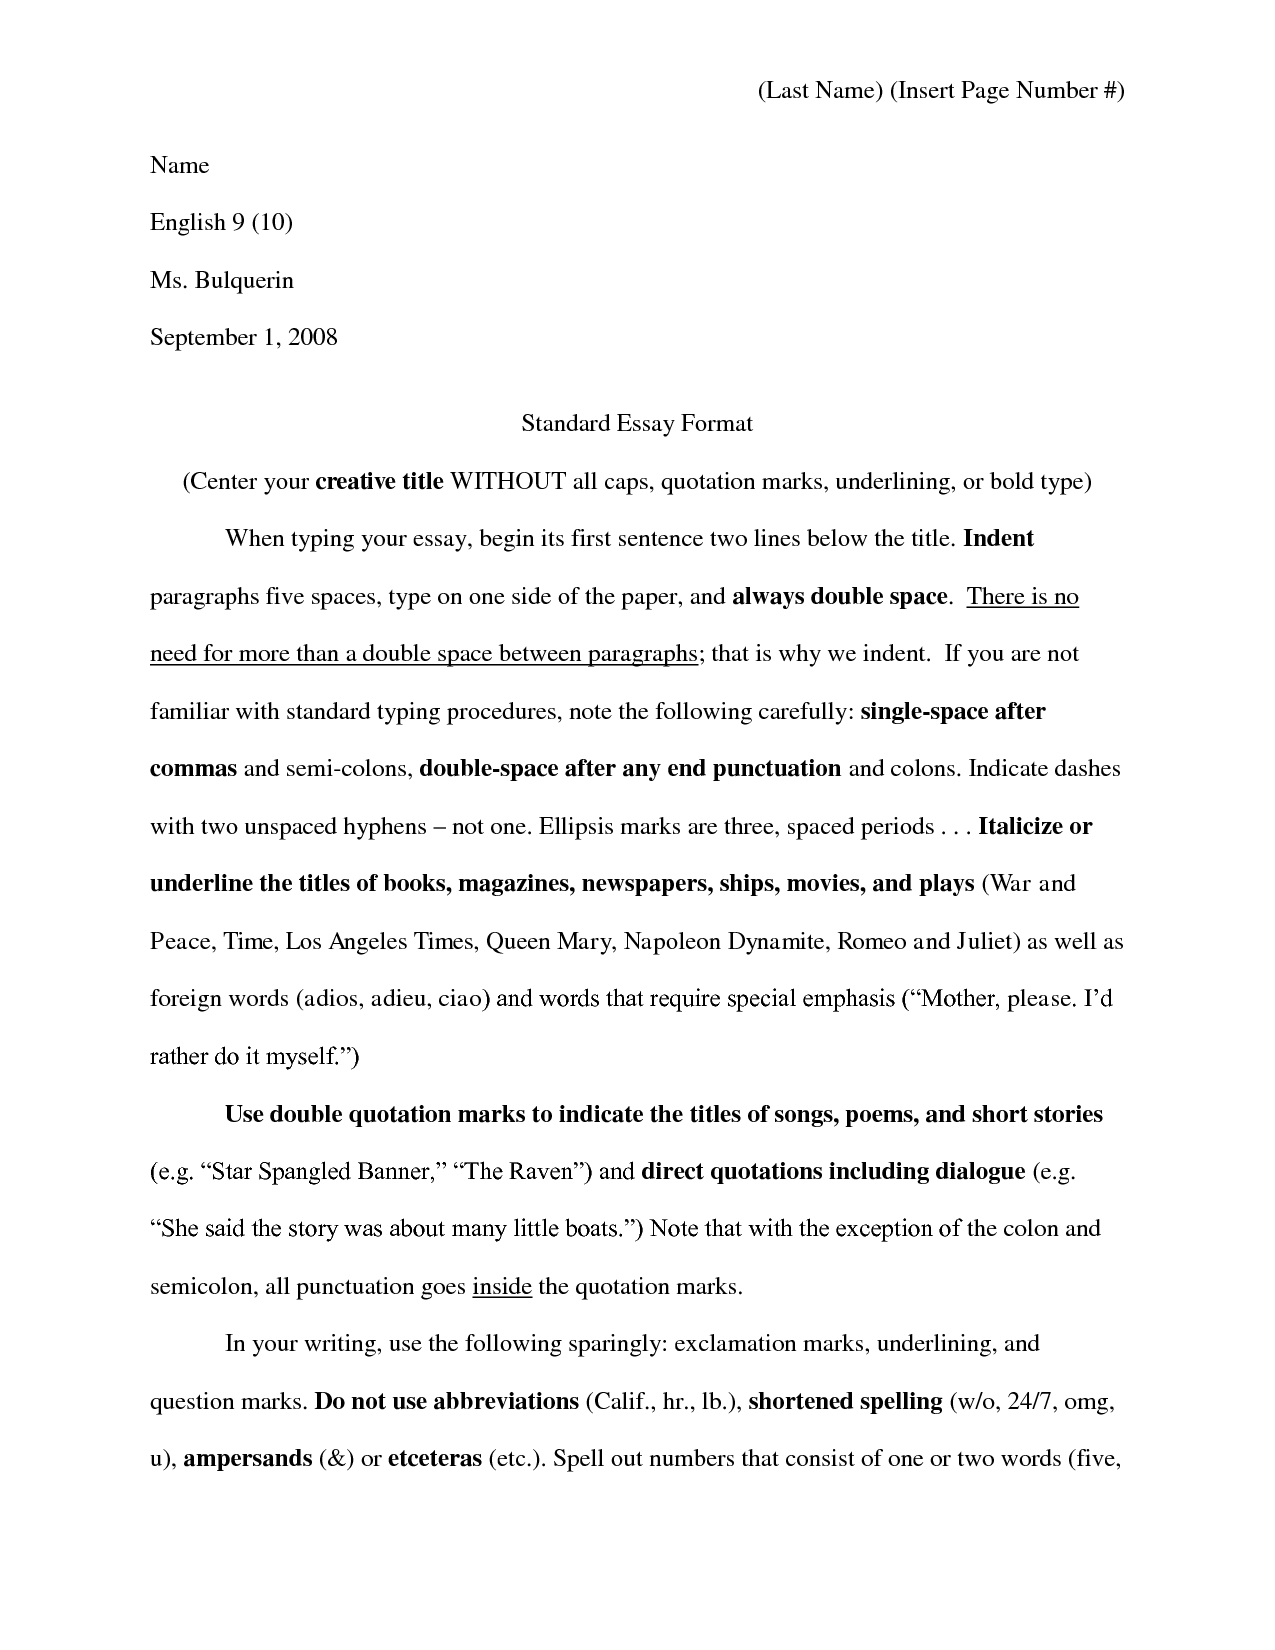 standard college paper format